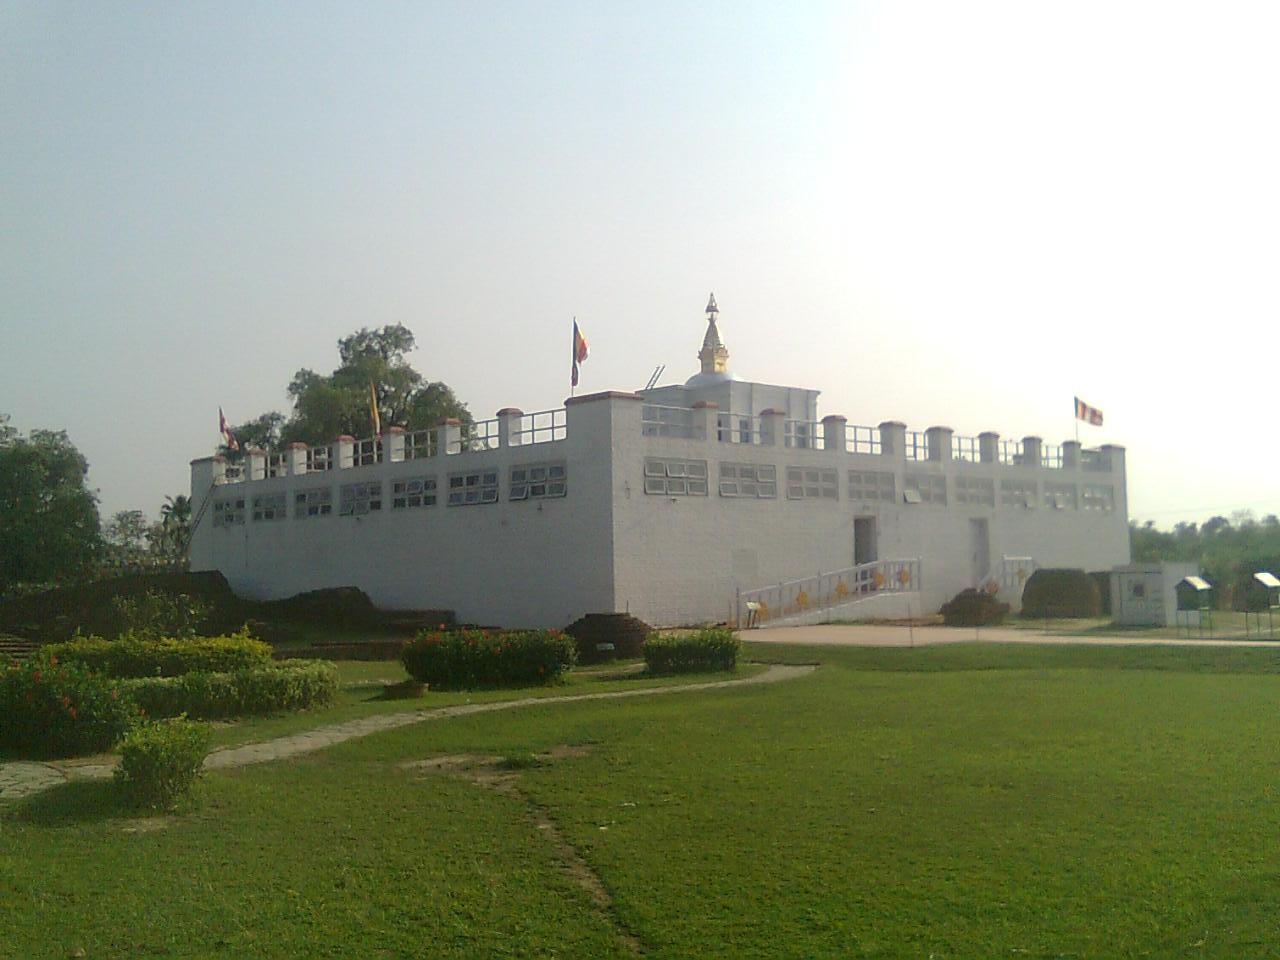 Lumbini Nepal  city photos gallery : The White Temple of Lumbini Nepal Mayadevi Temple 2